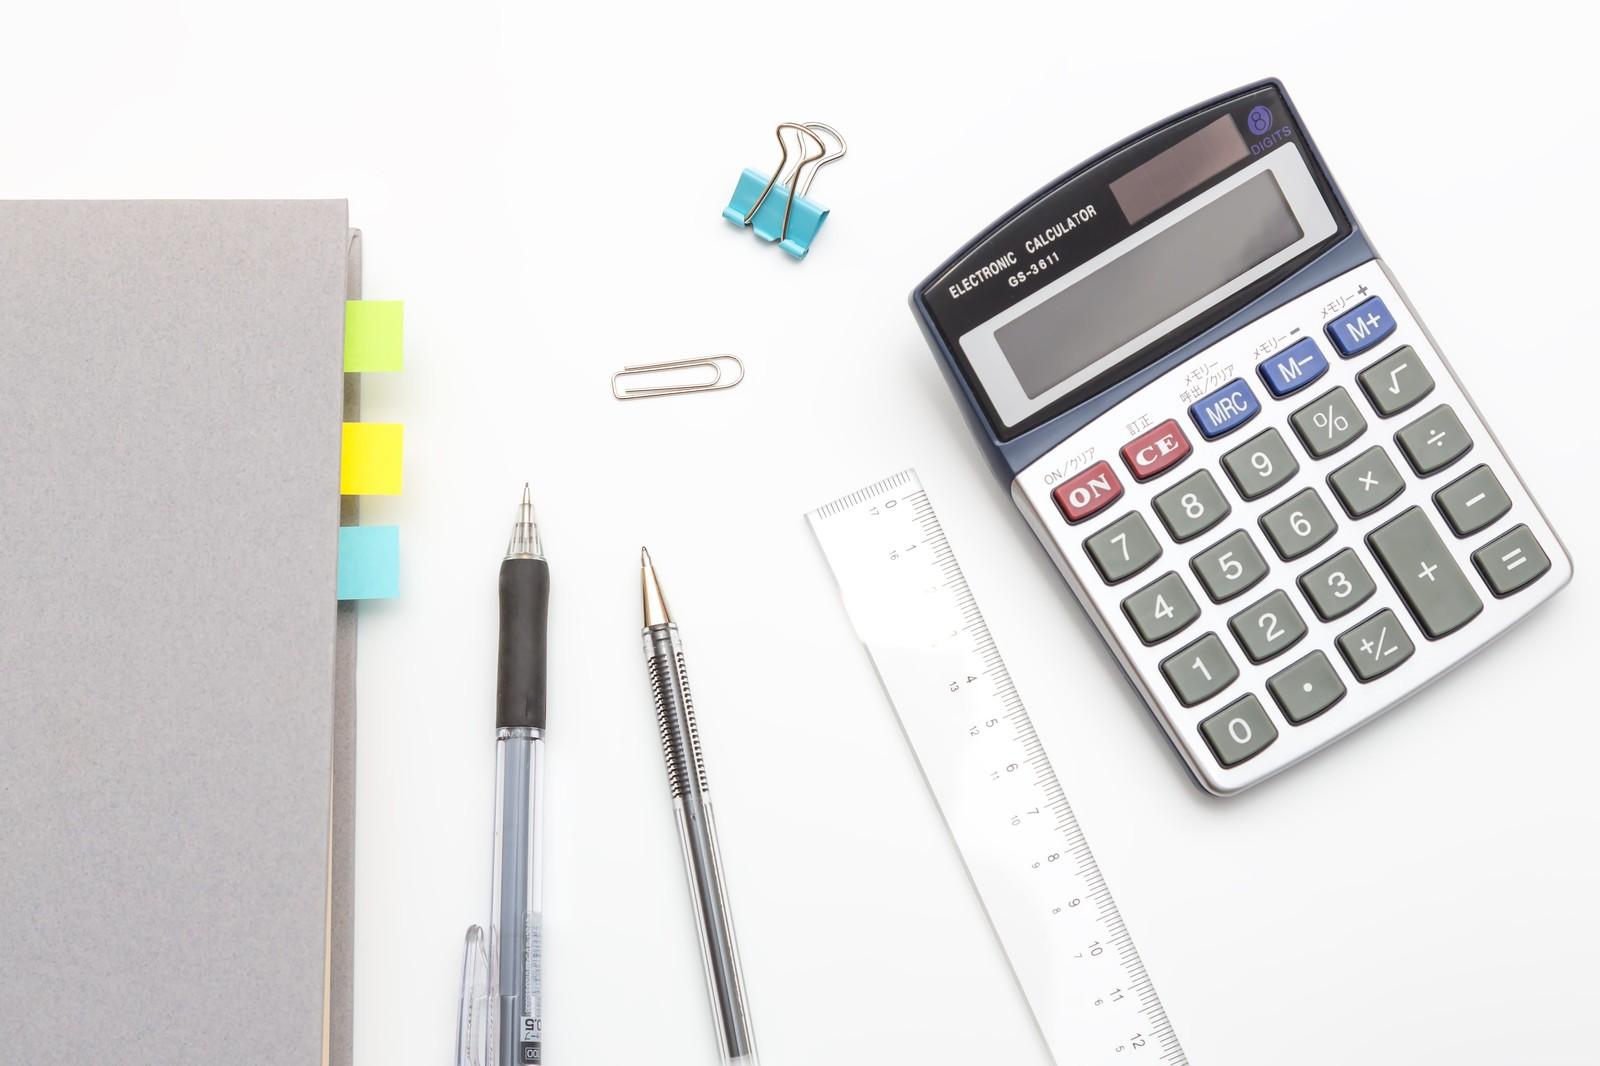 小規模事業者持続化補助金の書き方